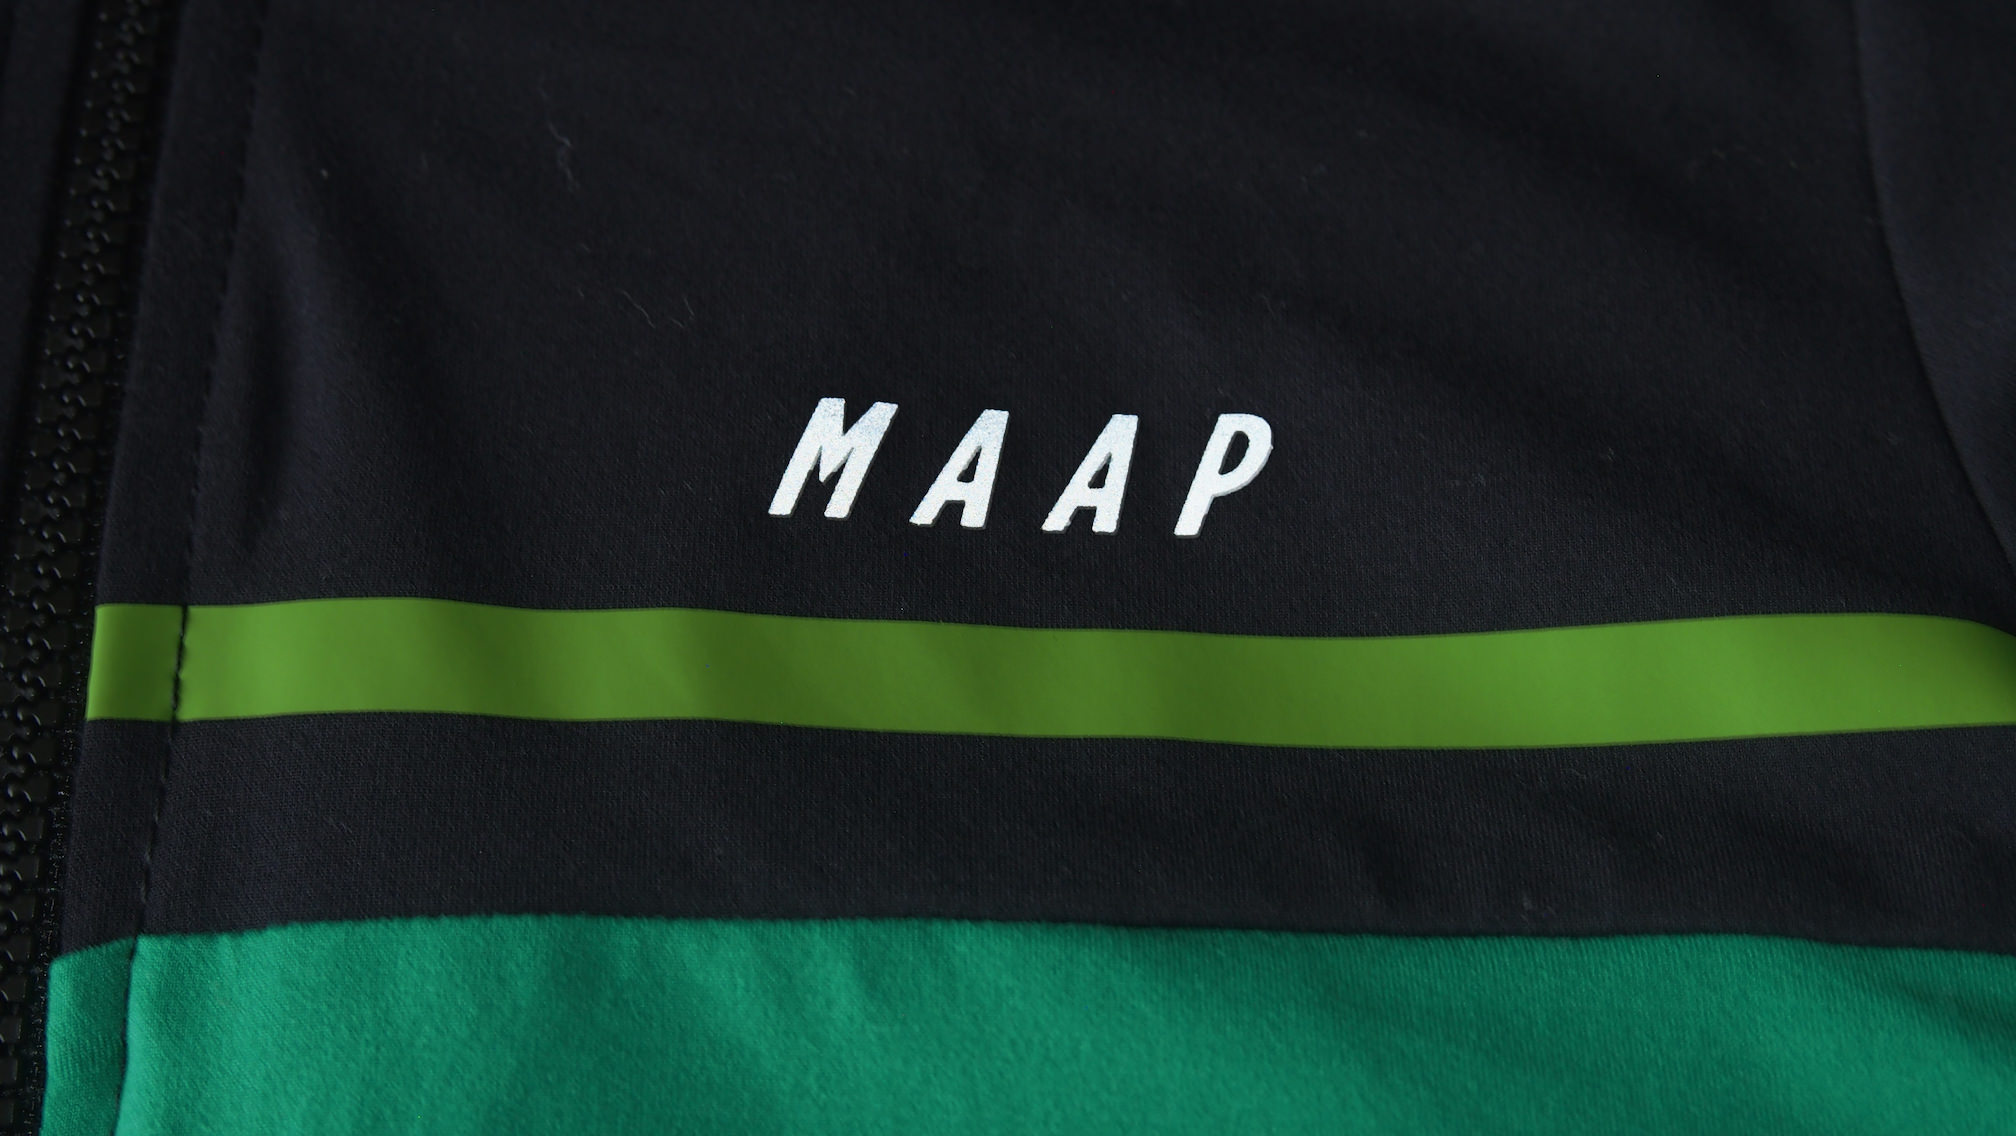 MAAP Segment Jersey 胸のロゴ